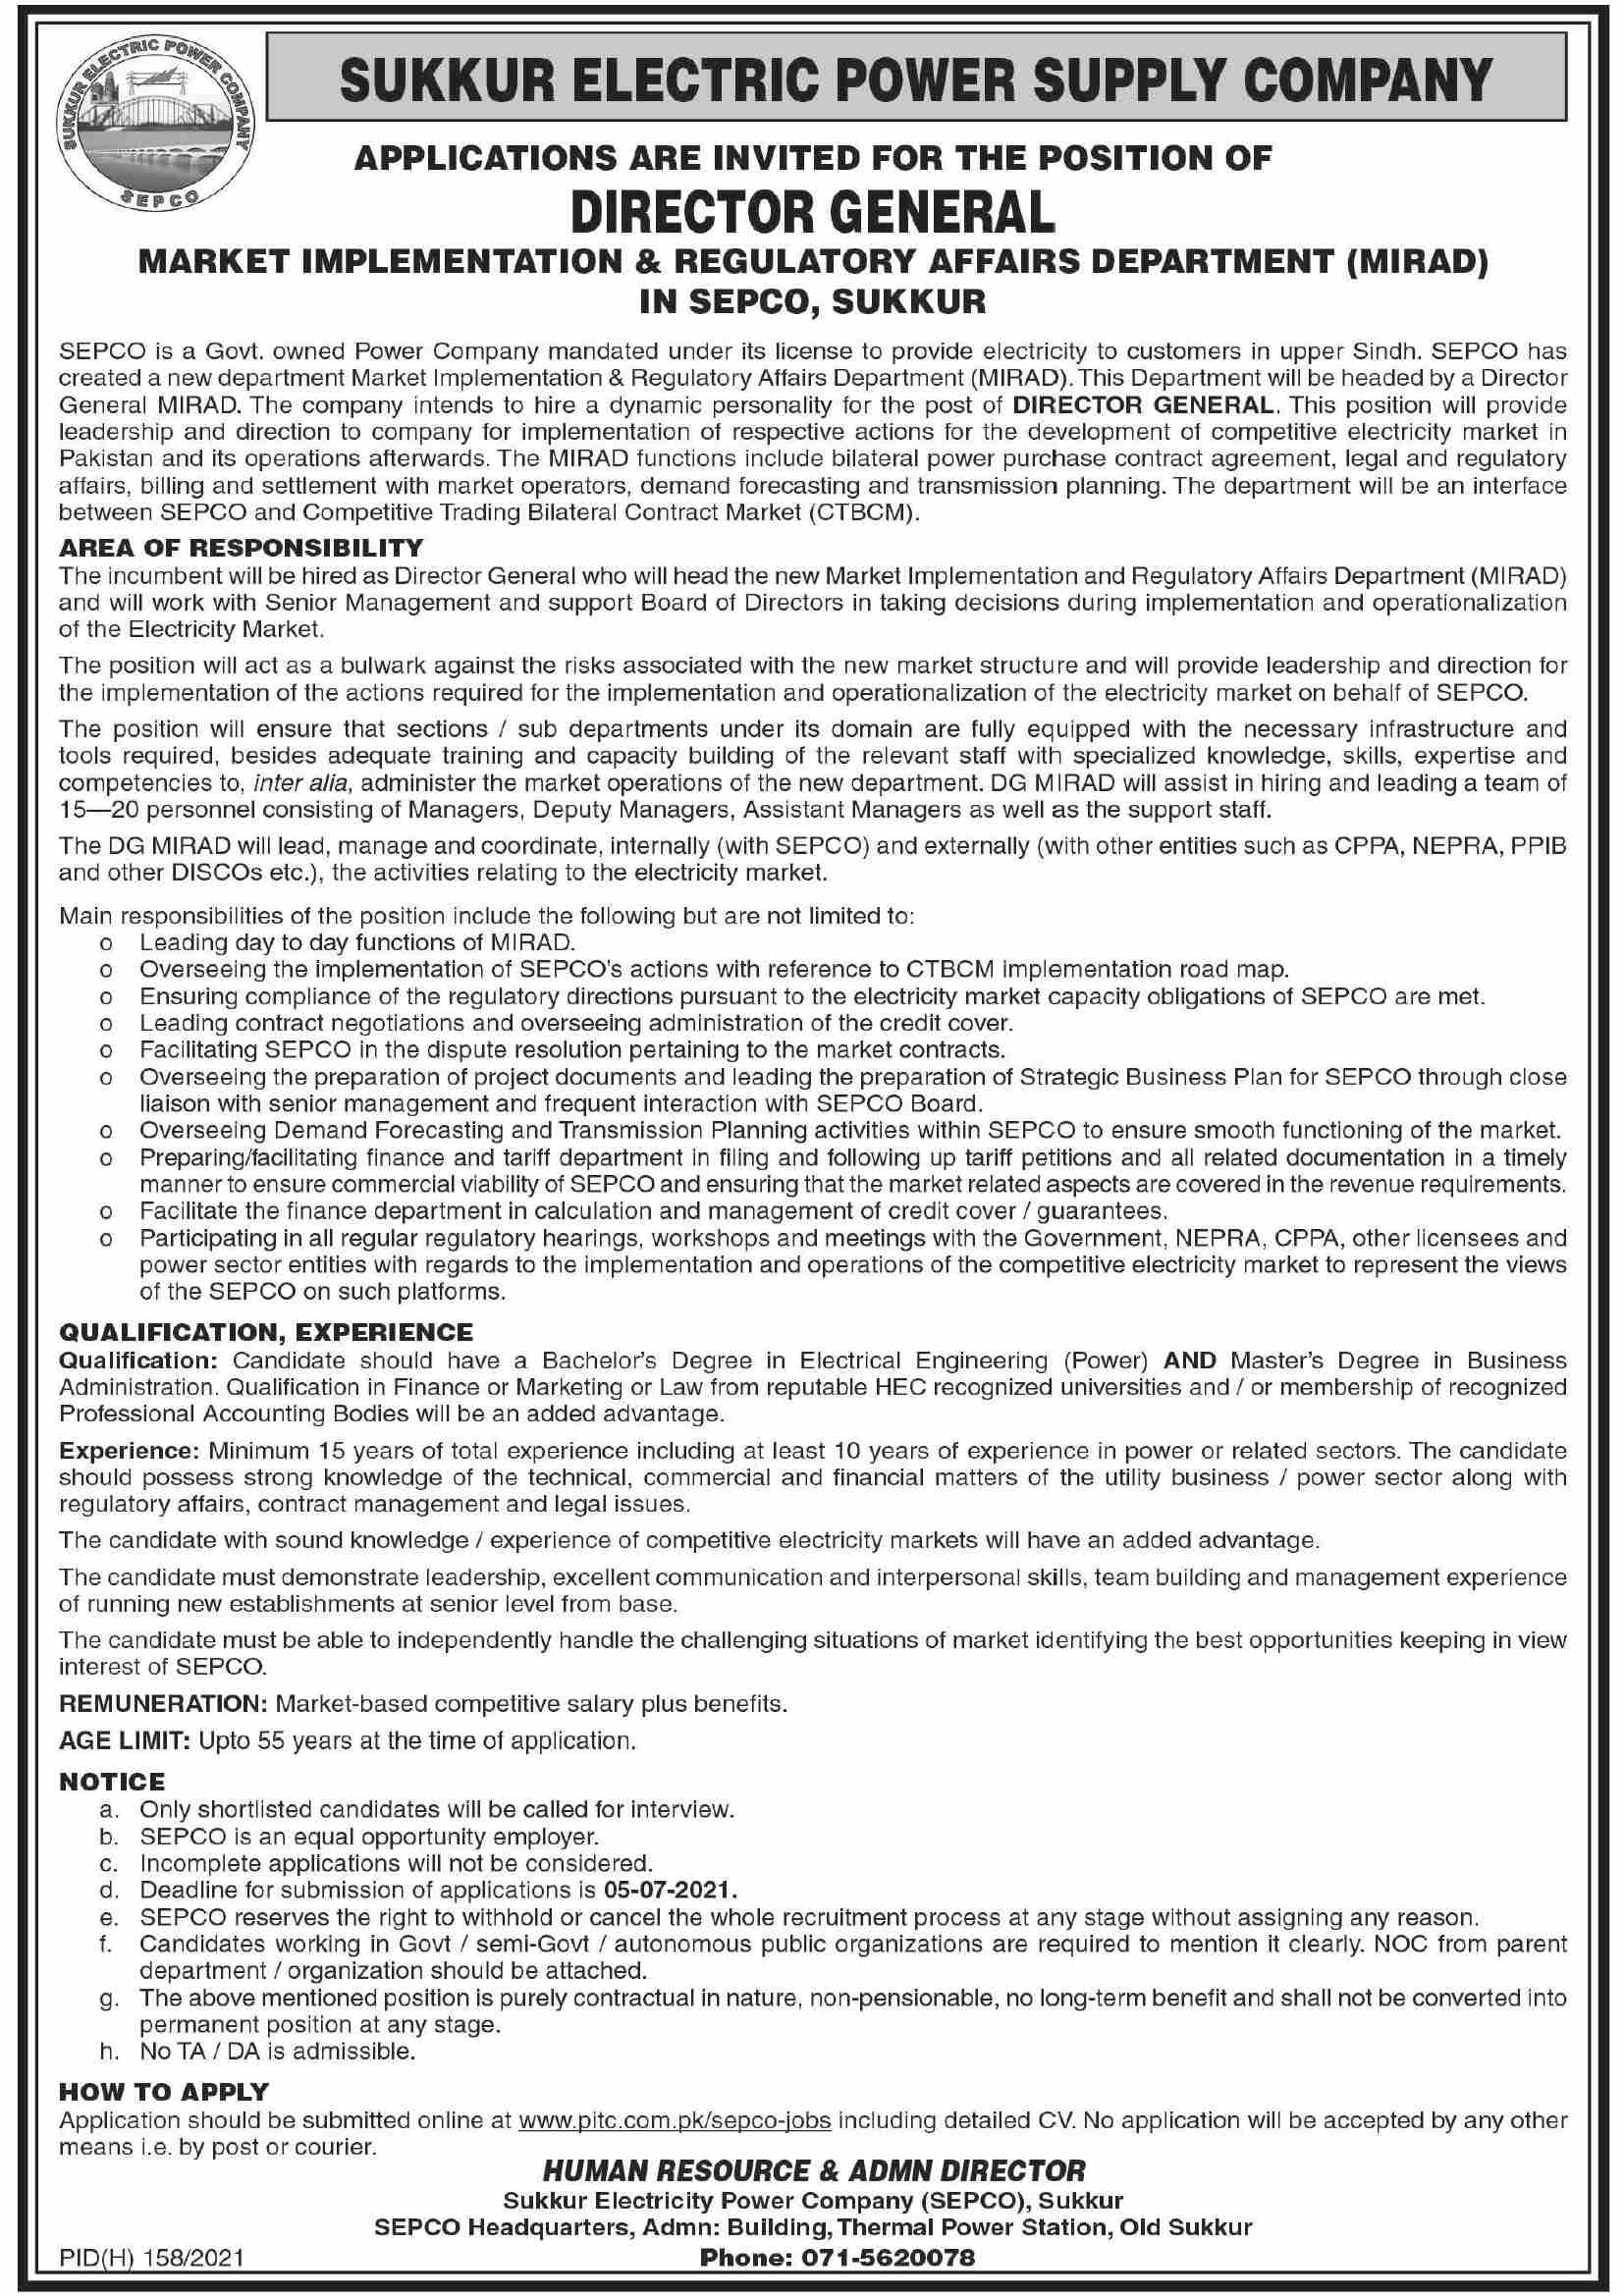 SEPCO Jobs in Sukkur 2021 Sukkur Electric Power Supply Company Job 2021